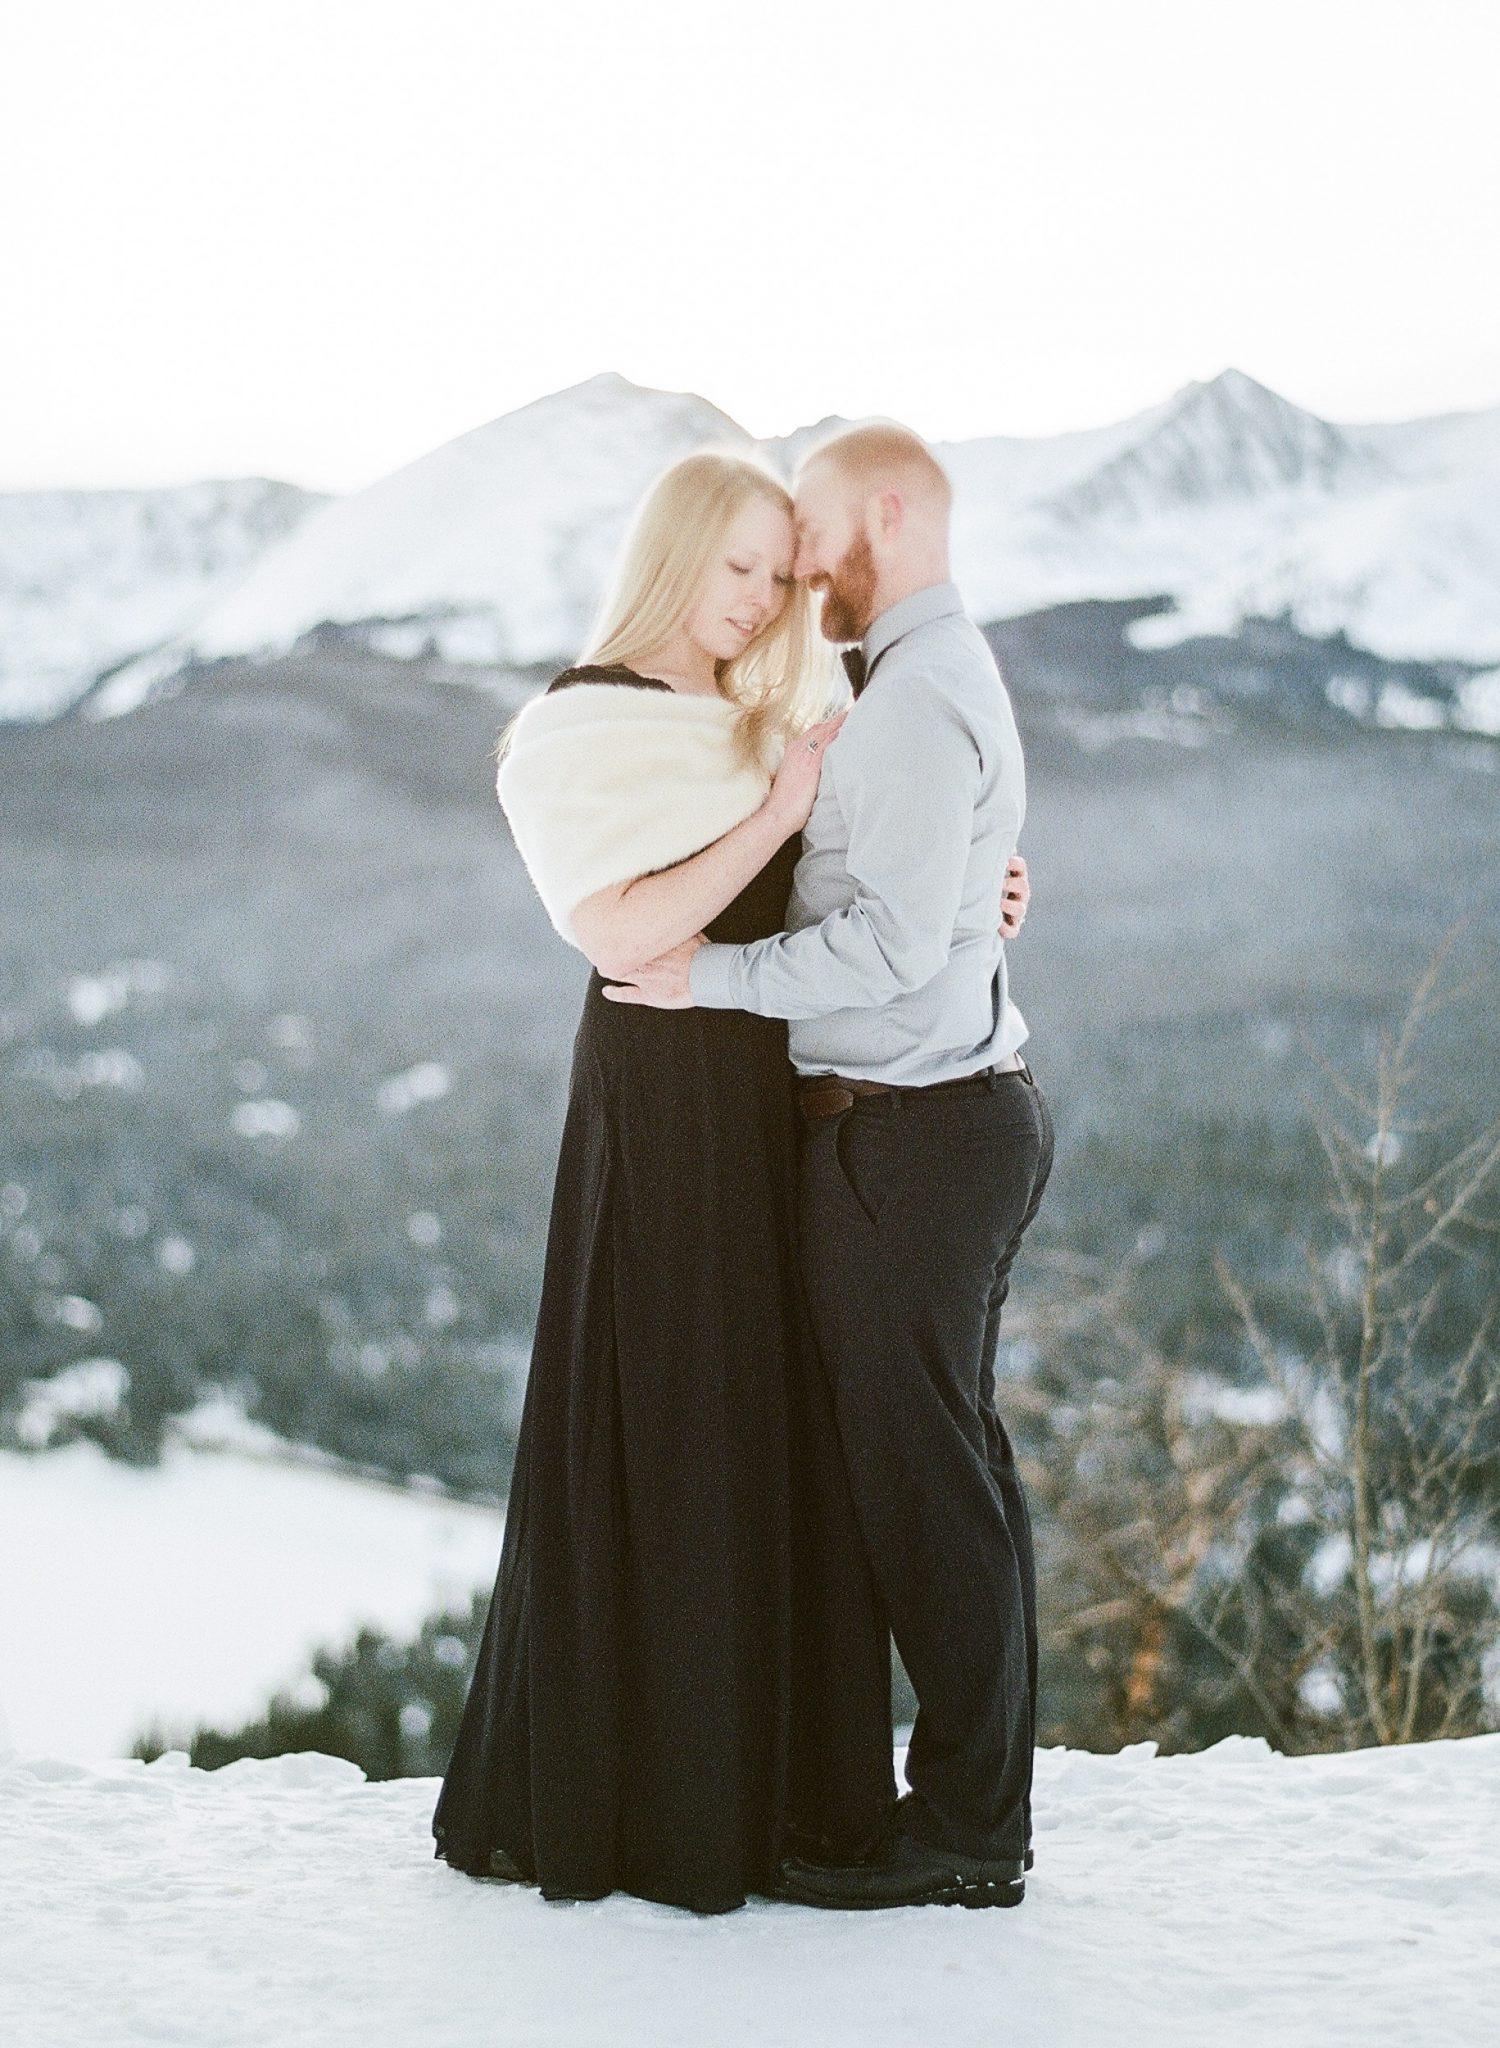 Gabbi and Ryan Breckenridge, Colorado